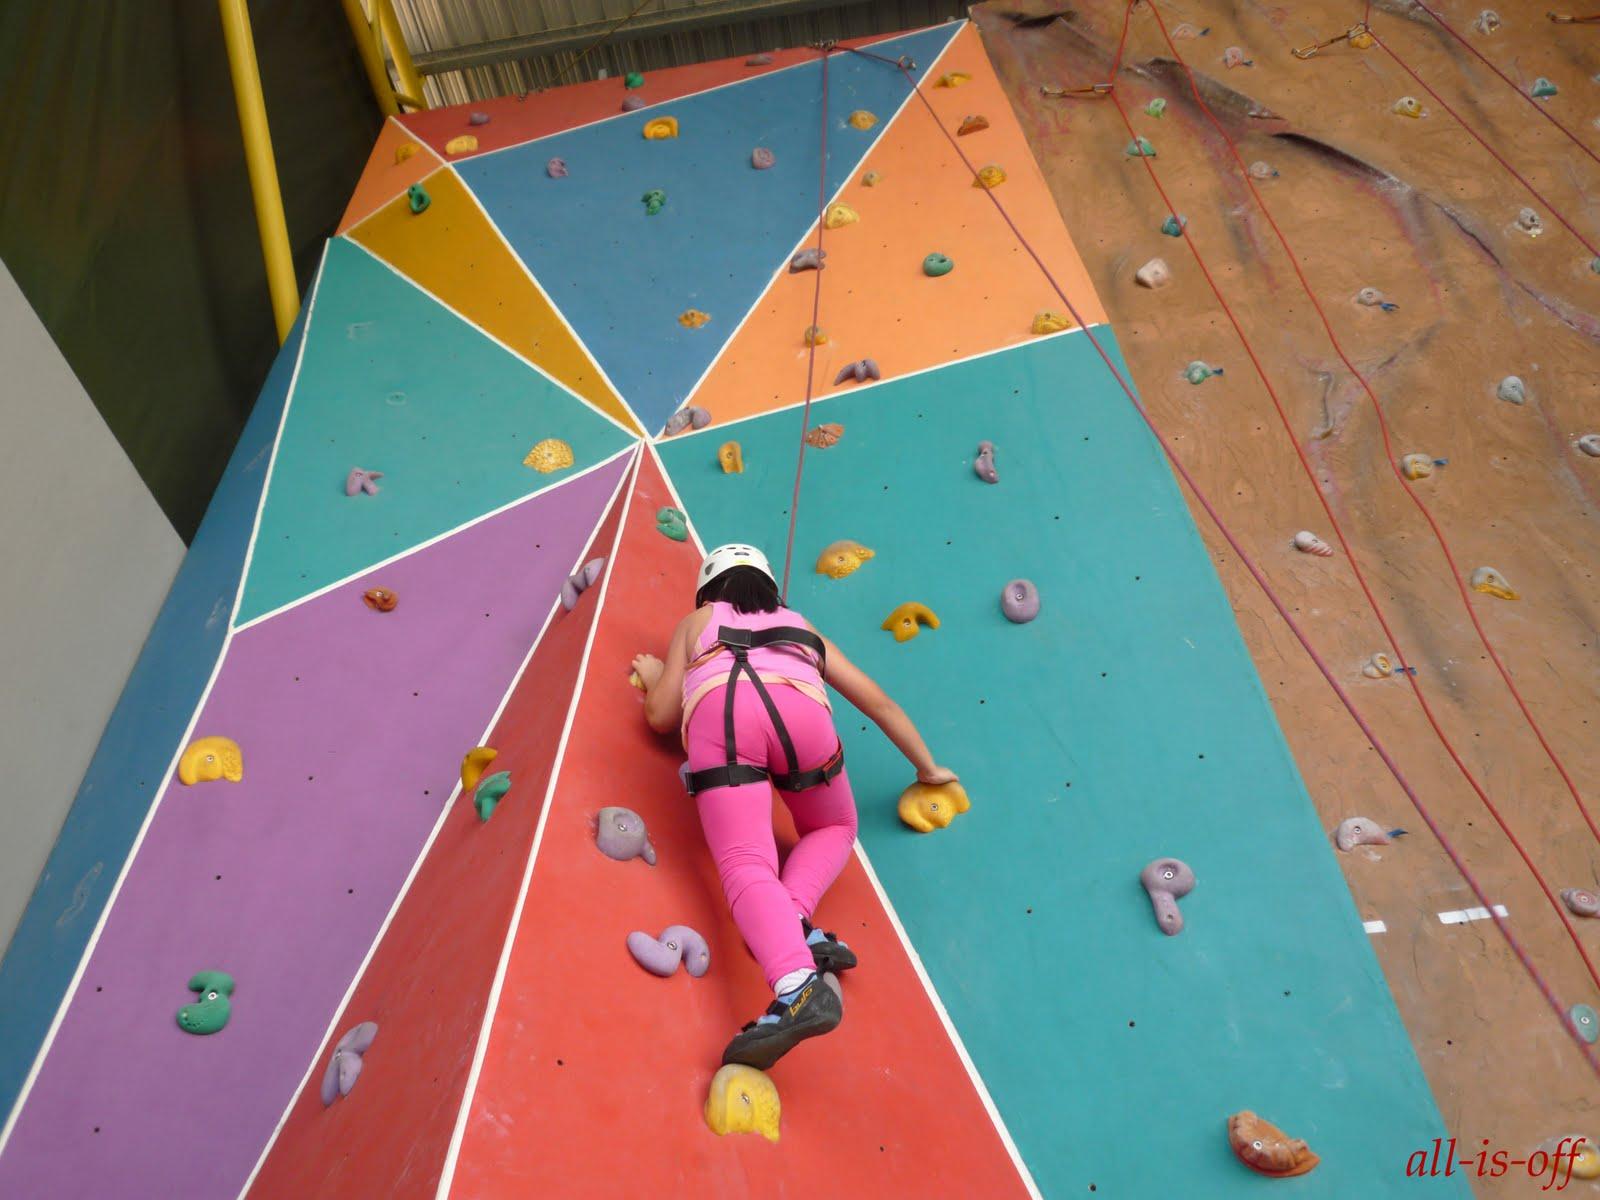 http://1.bp.blogspot.com/_sVQGbNRhsZw/TJir9Wz1AbI/AAAAAAAABGk/UFyHLxn7Lug/s1600/climb2.jpg